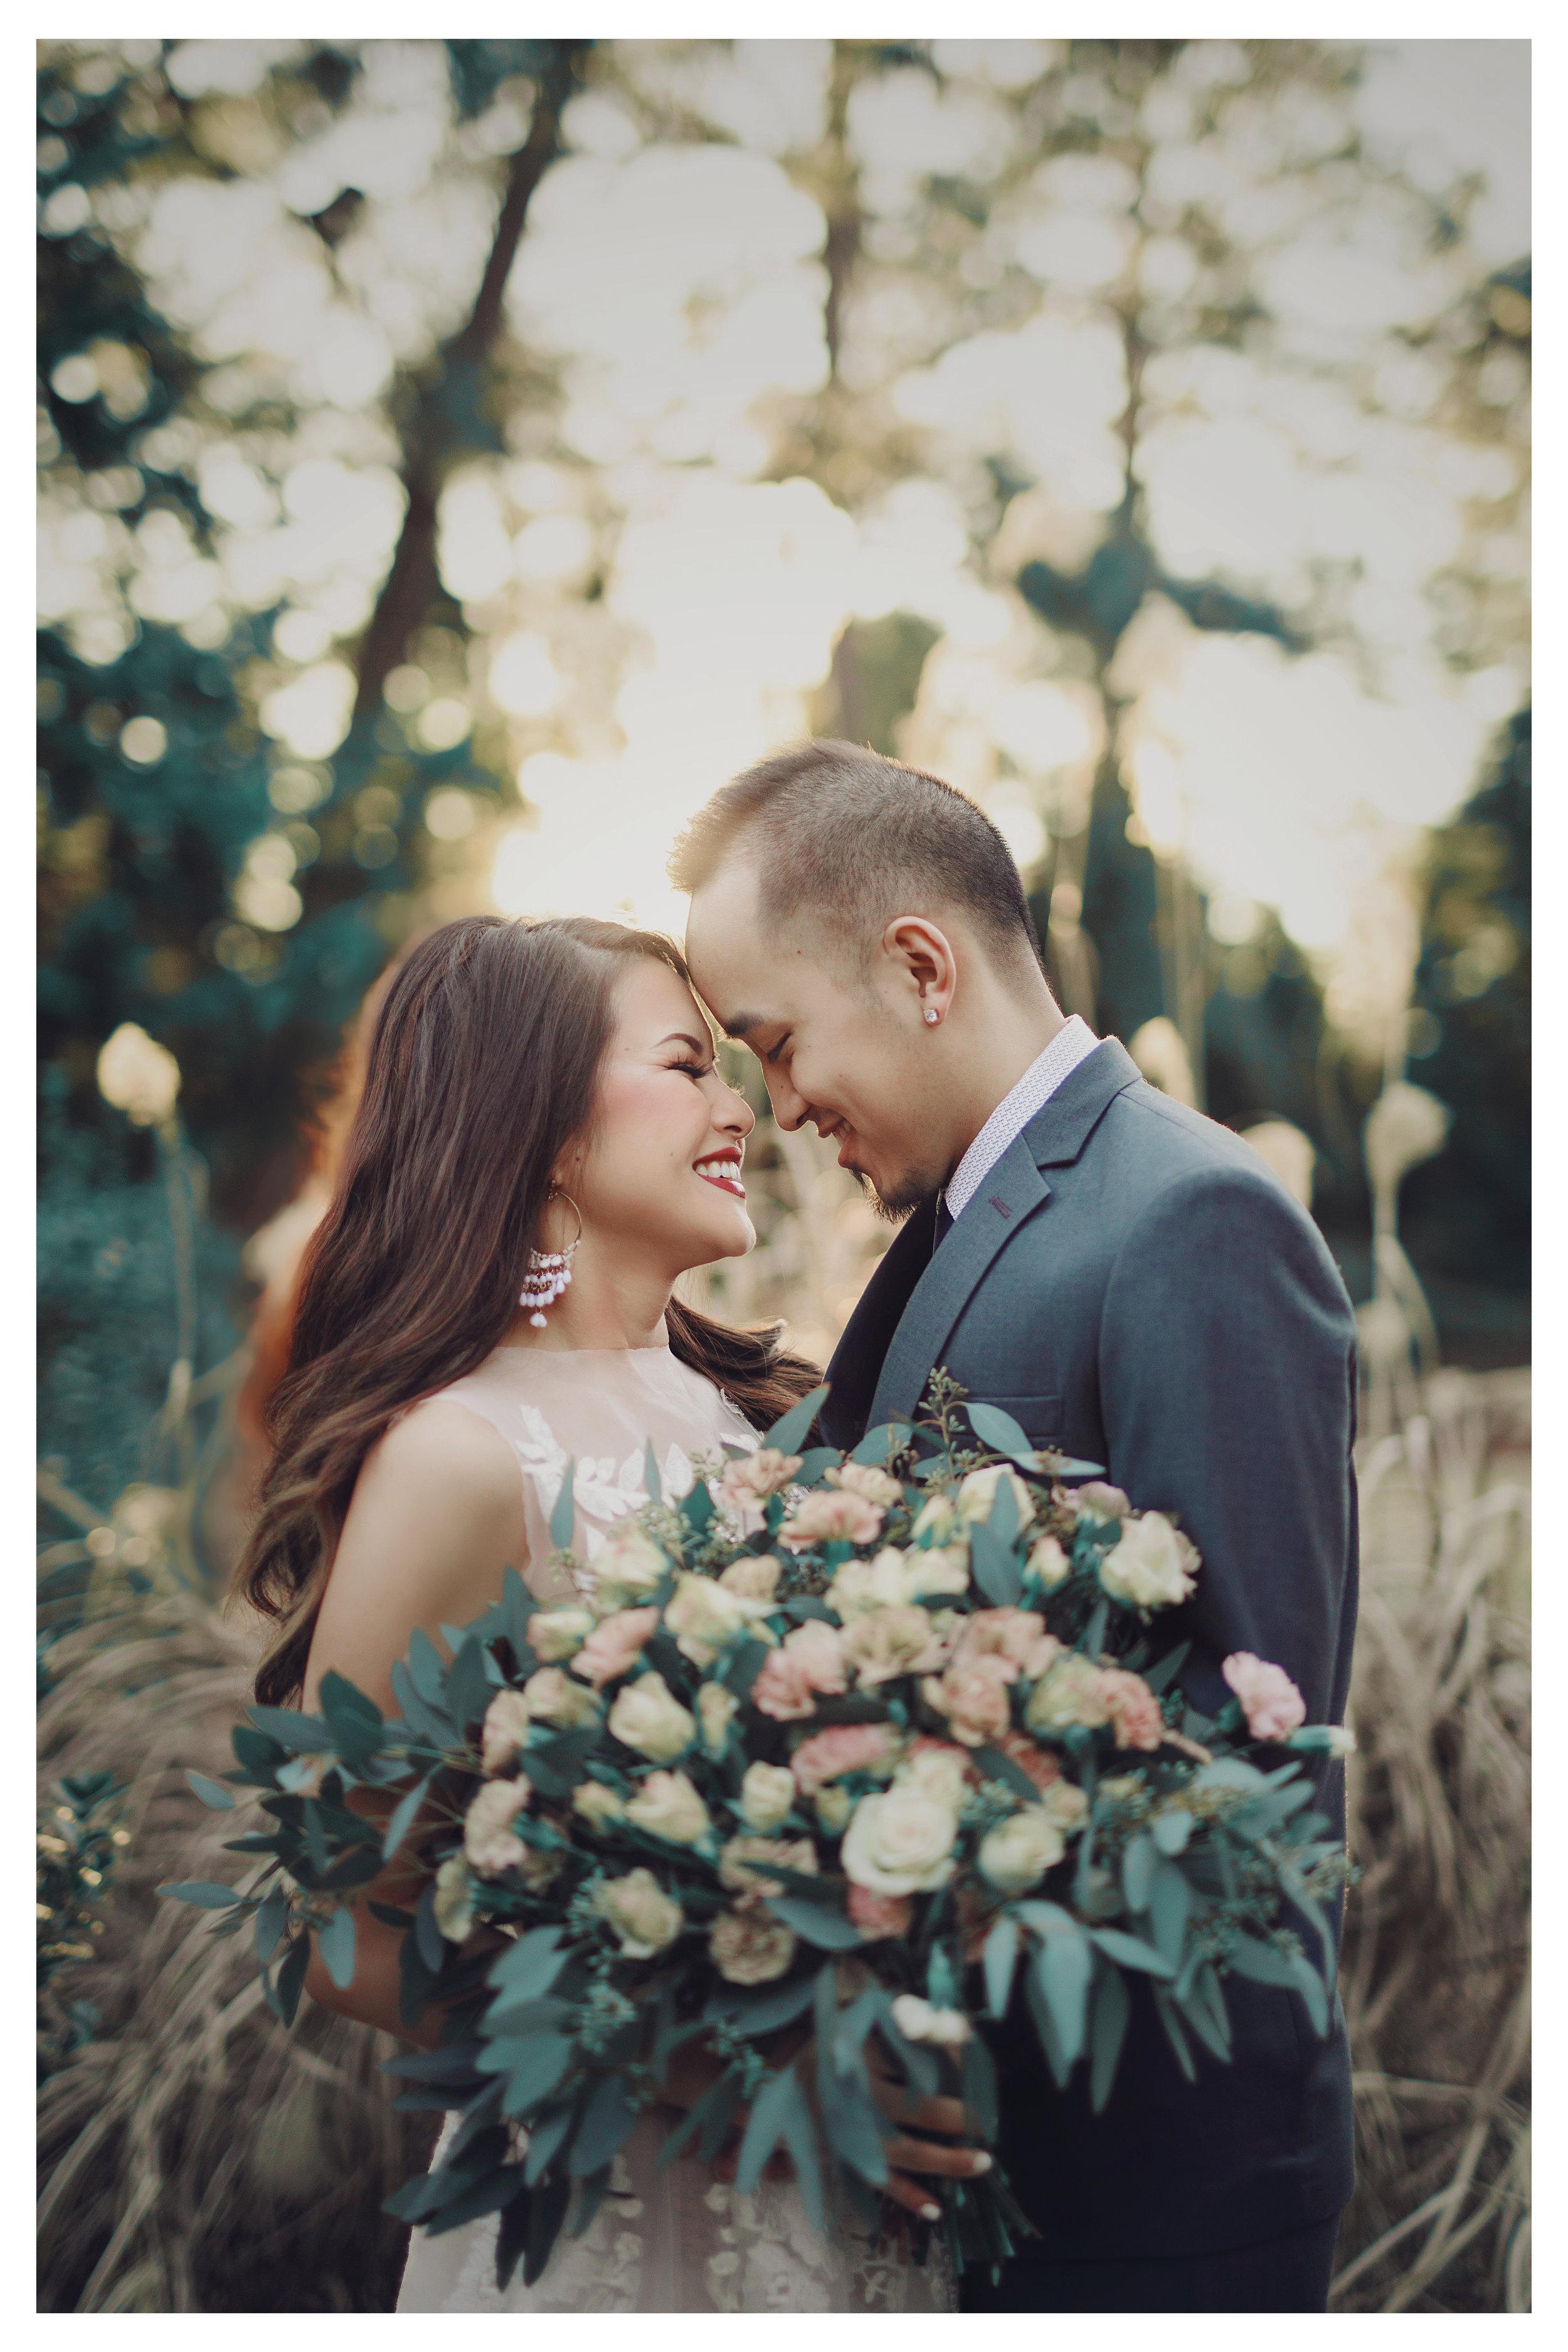 Lisa wedding-13copy.jpg